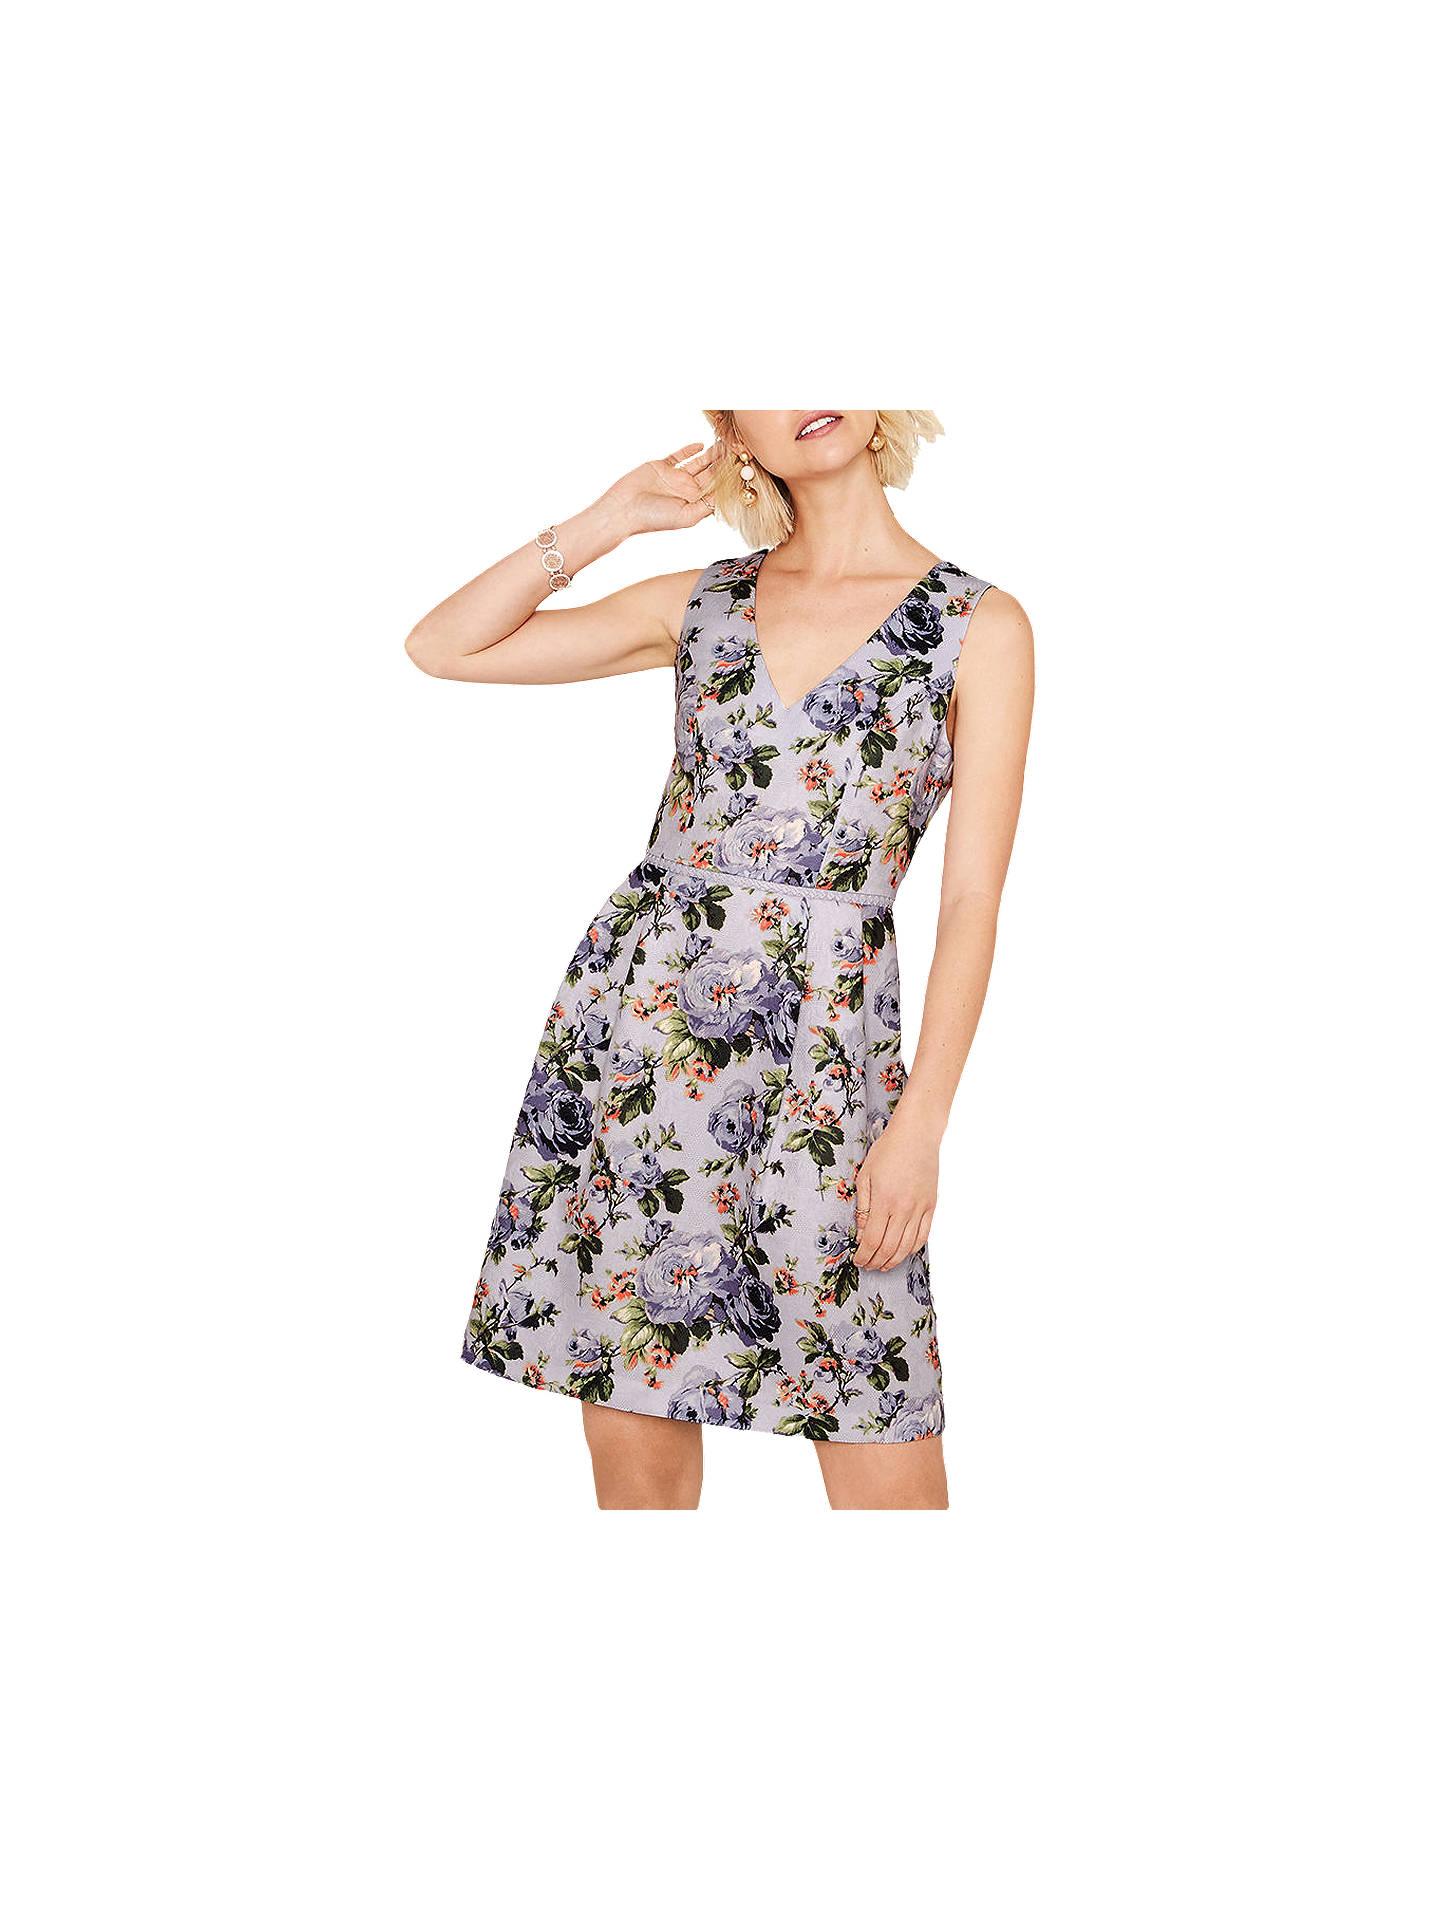 2b41293c91 BuyOasis Provence Rose Skater Dress